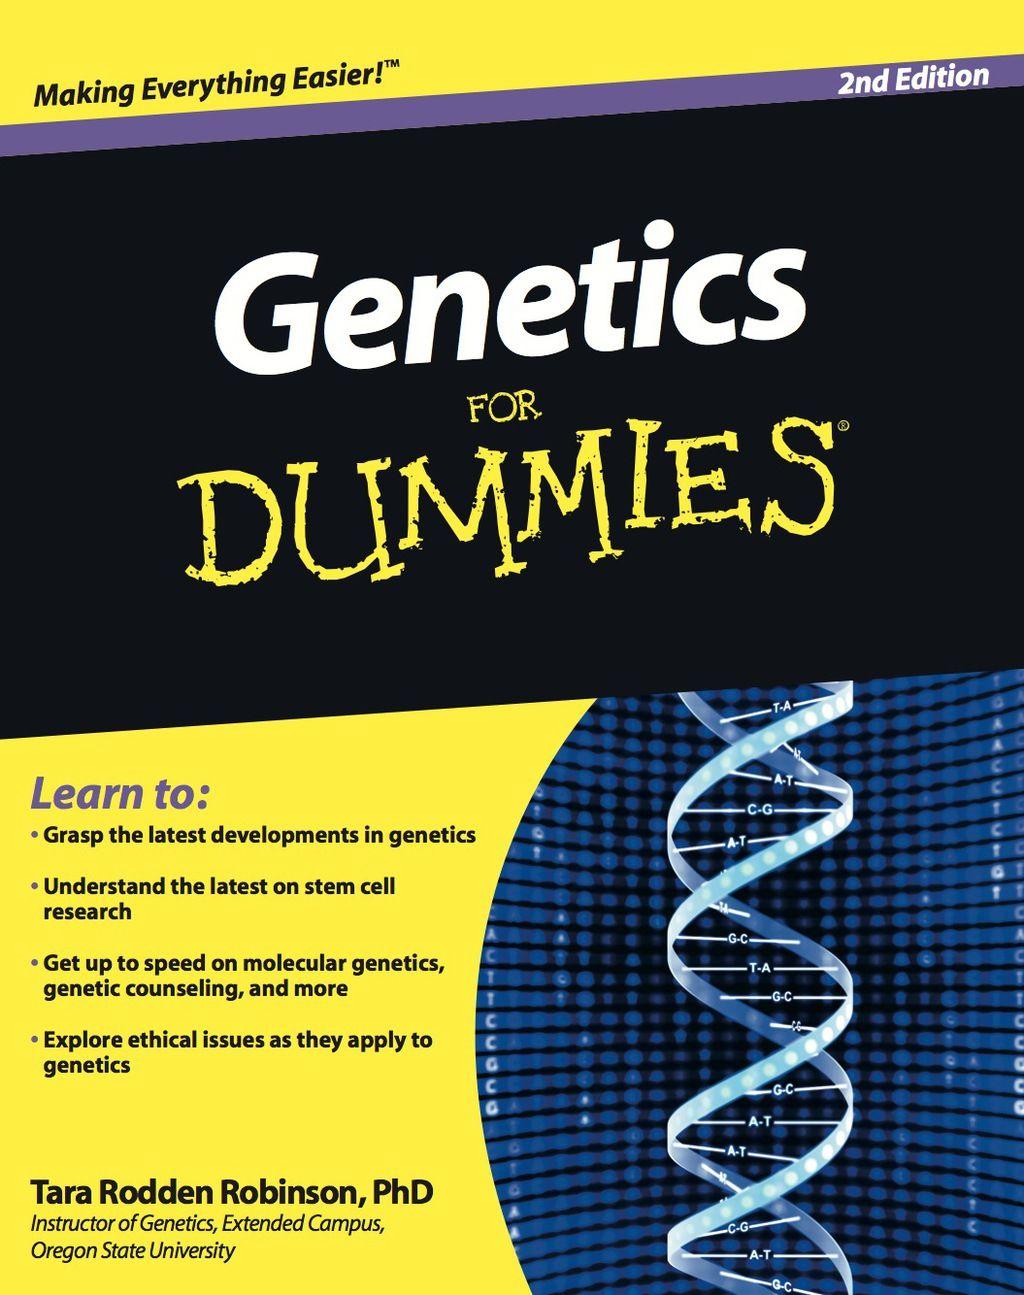 Pin By Amanda J Seehusen On Books In 2020 Genetic Counseling Math Methods Learning Math